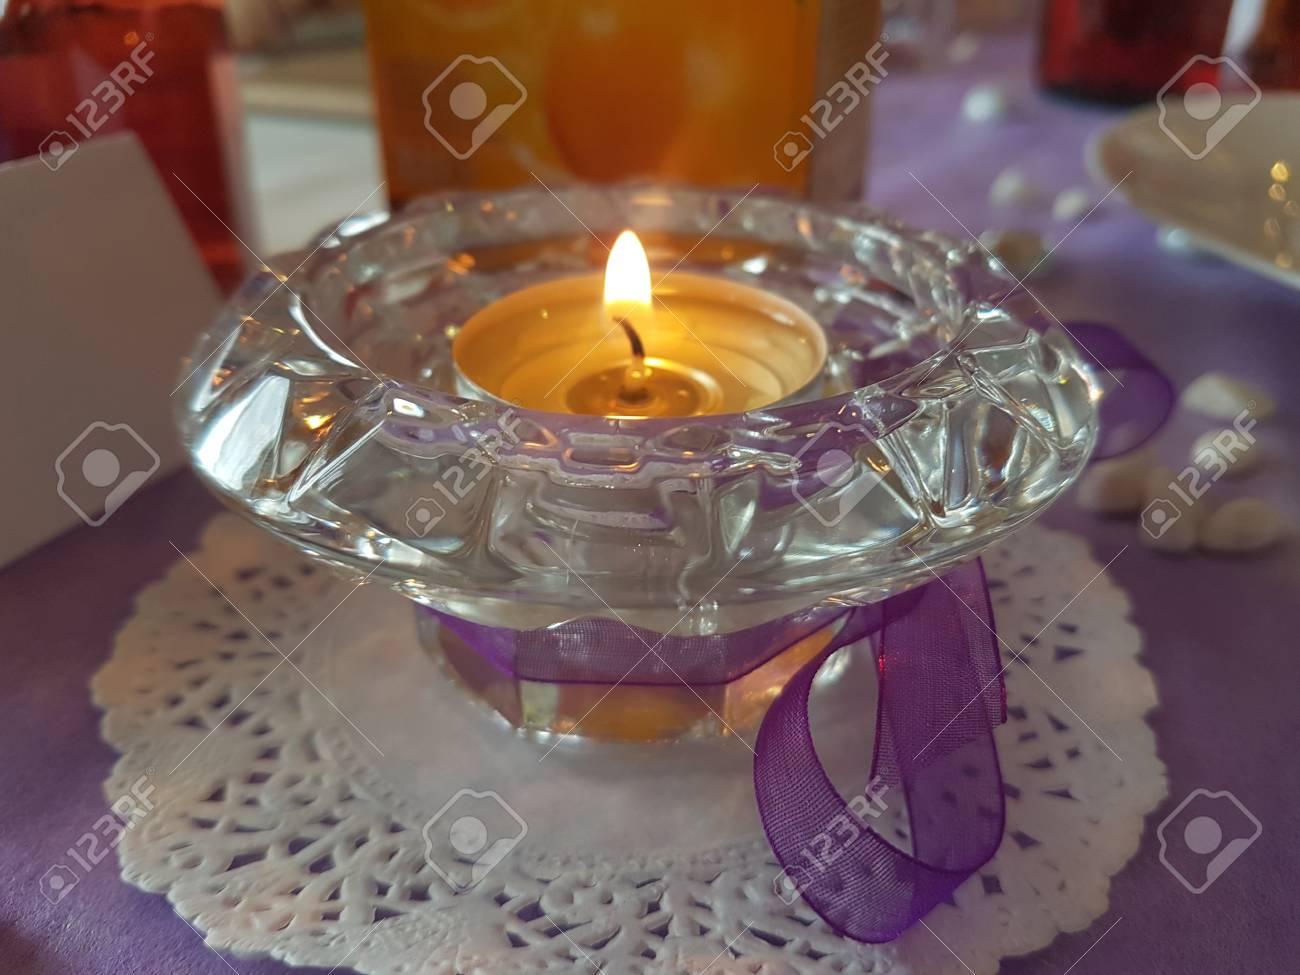 Bougie Parfumee Decorative Dans Un Recipient En Verre Banque D